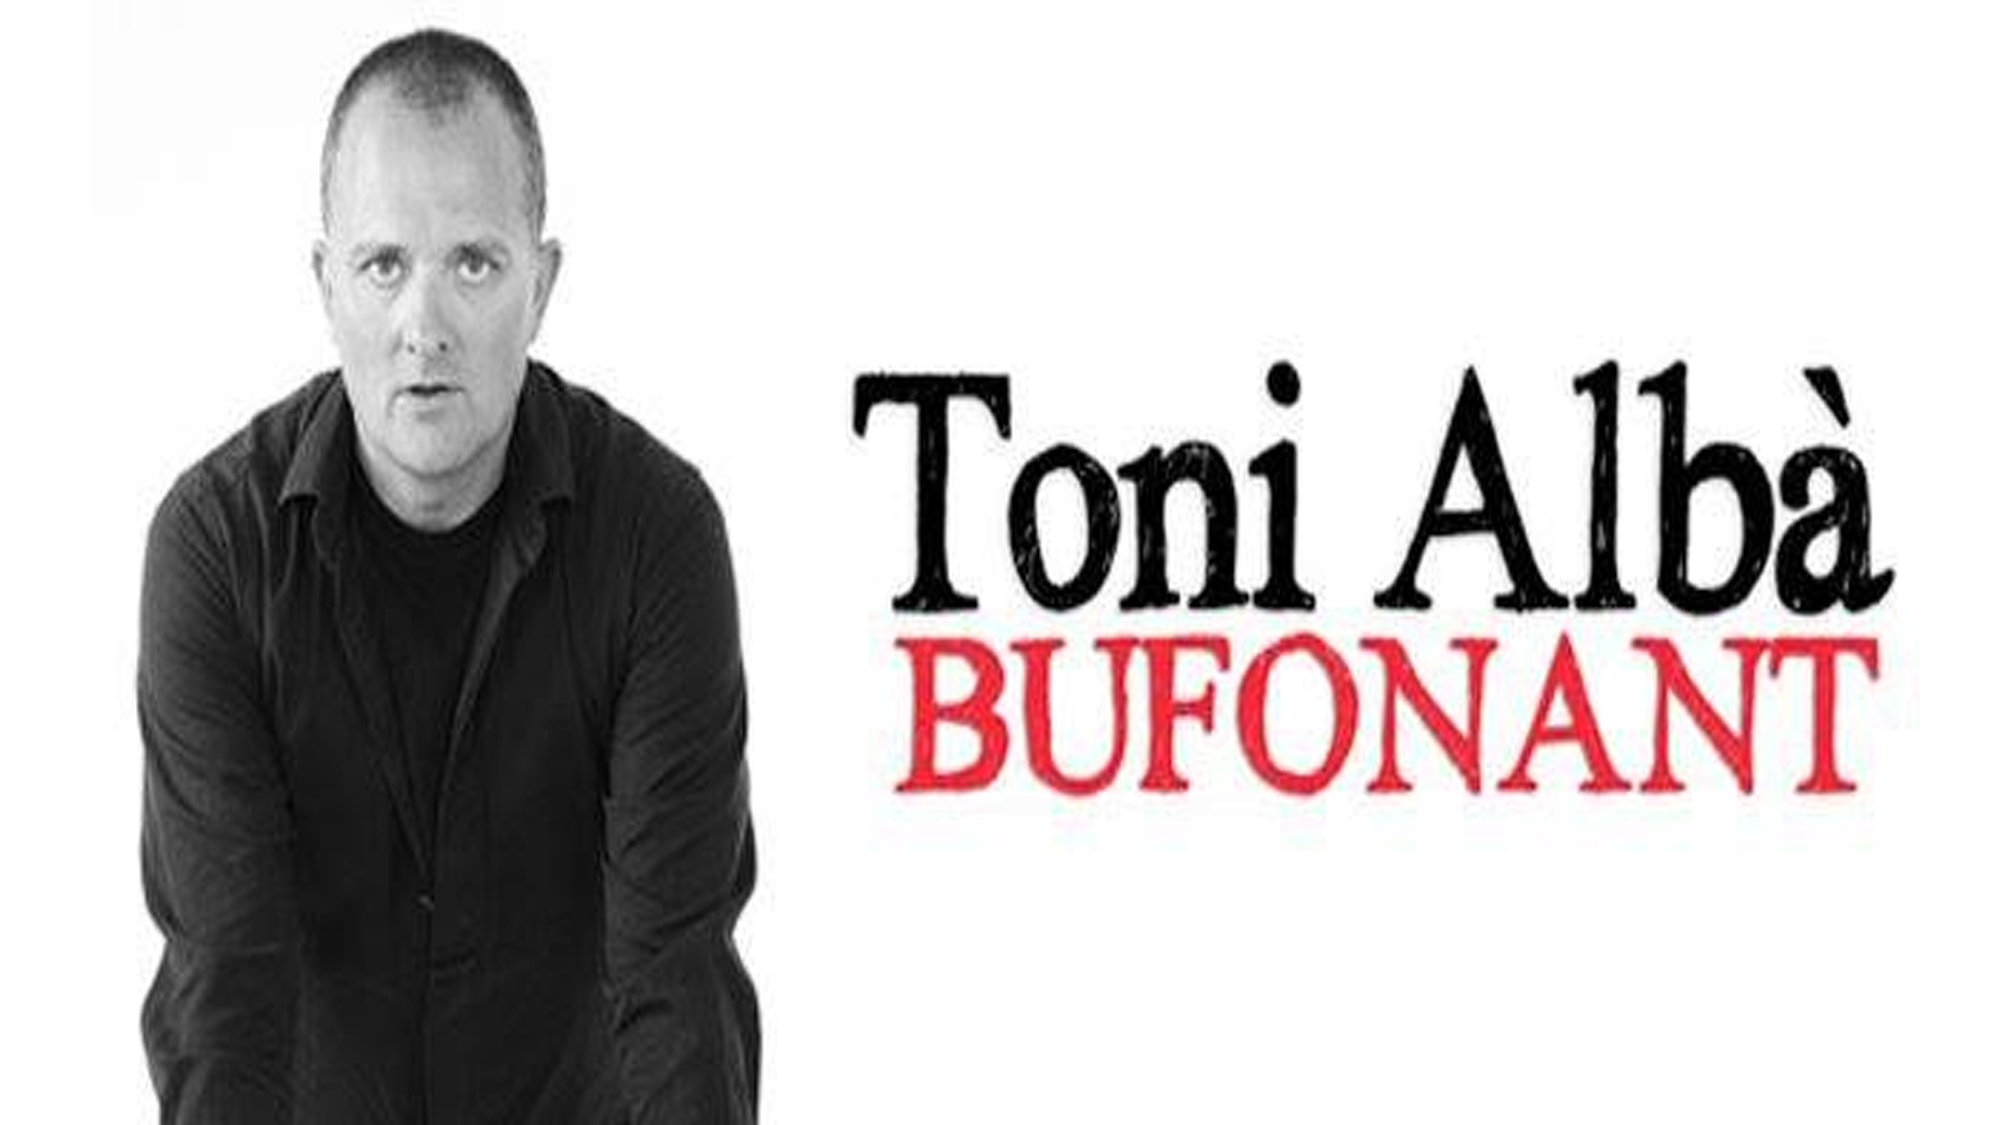 Bufonant (Cia Toni Albà)